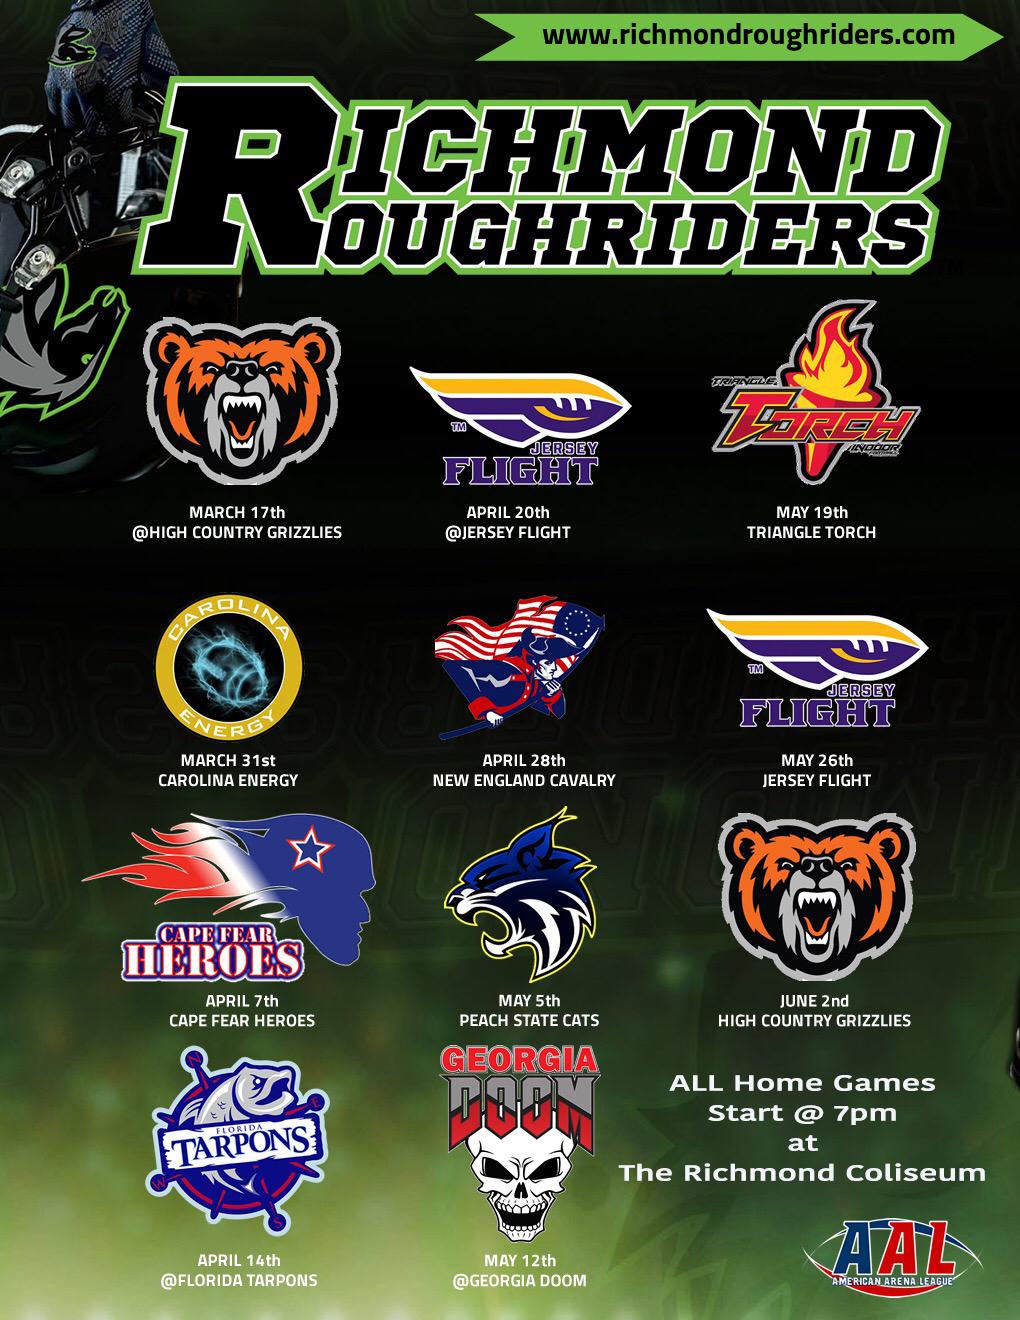 Richmond RoughRiders